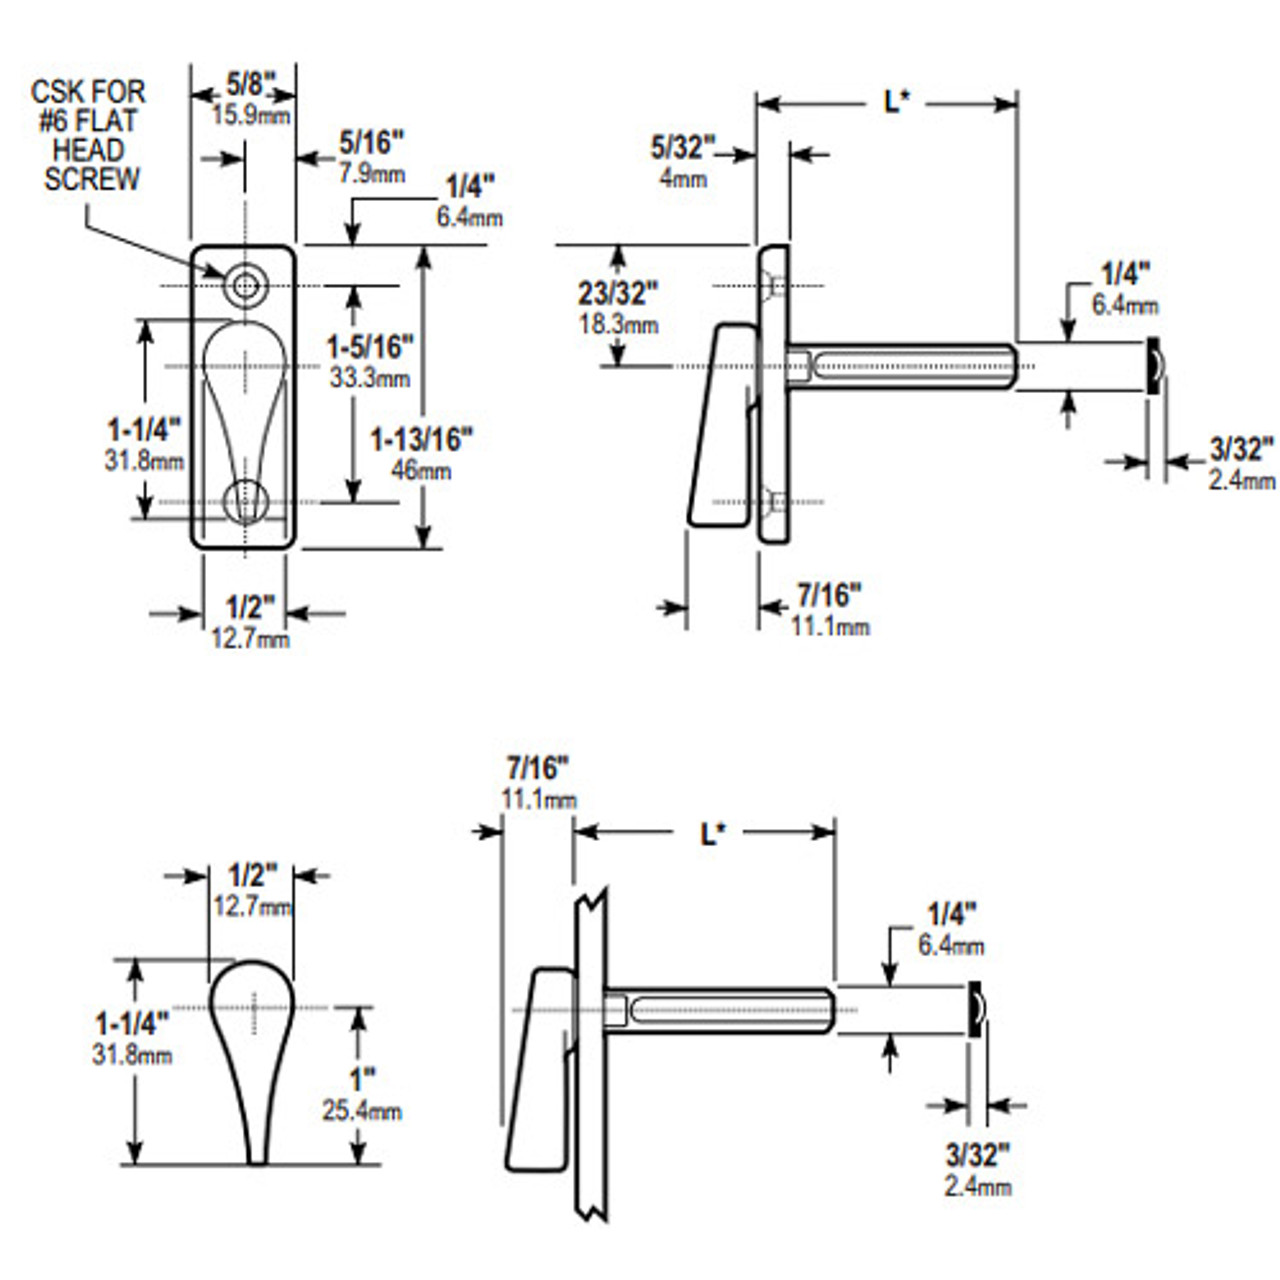 1000-11-11-121 Adams Rite 1000 Series Turns Dimensional View